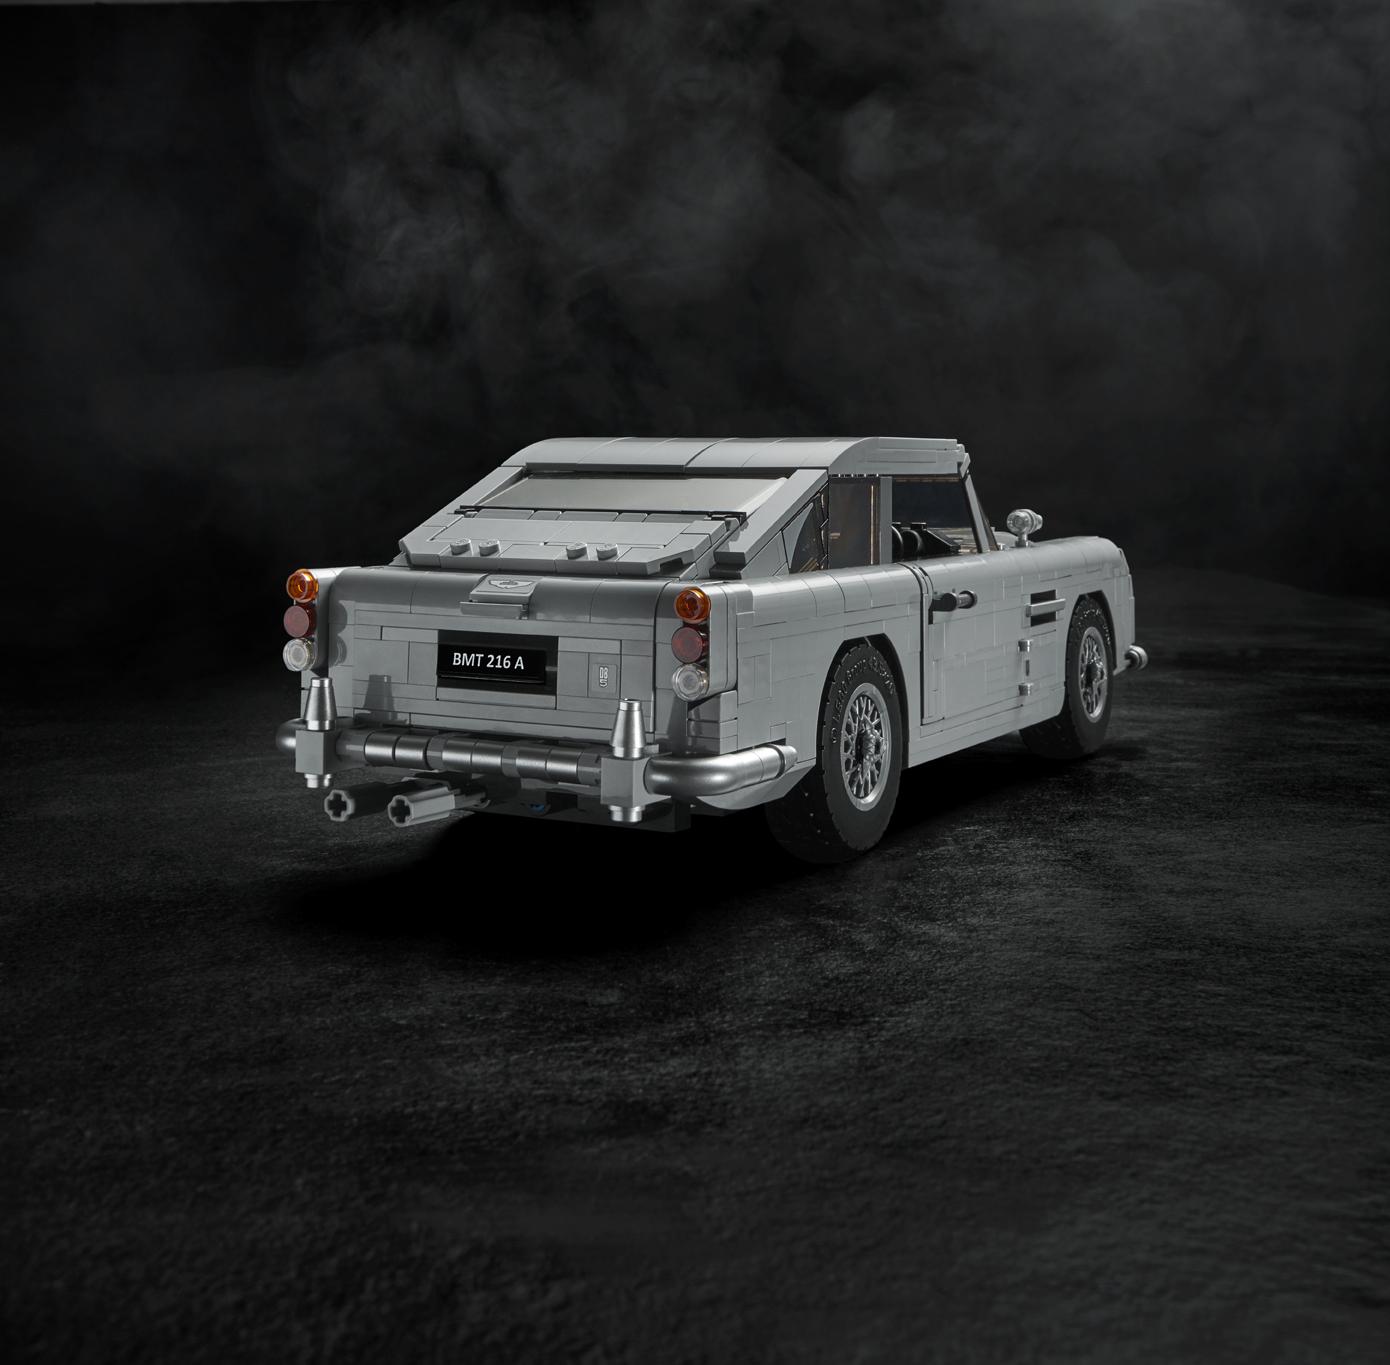 Aston martin james bond db5 price